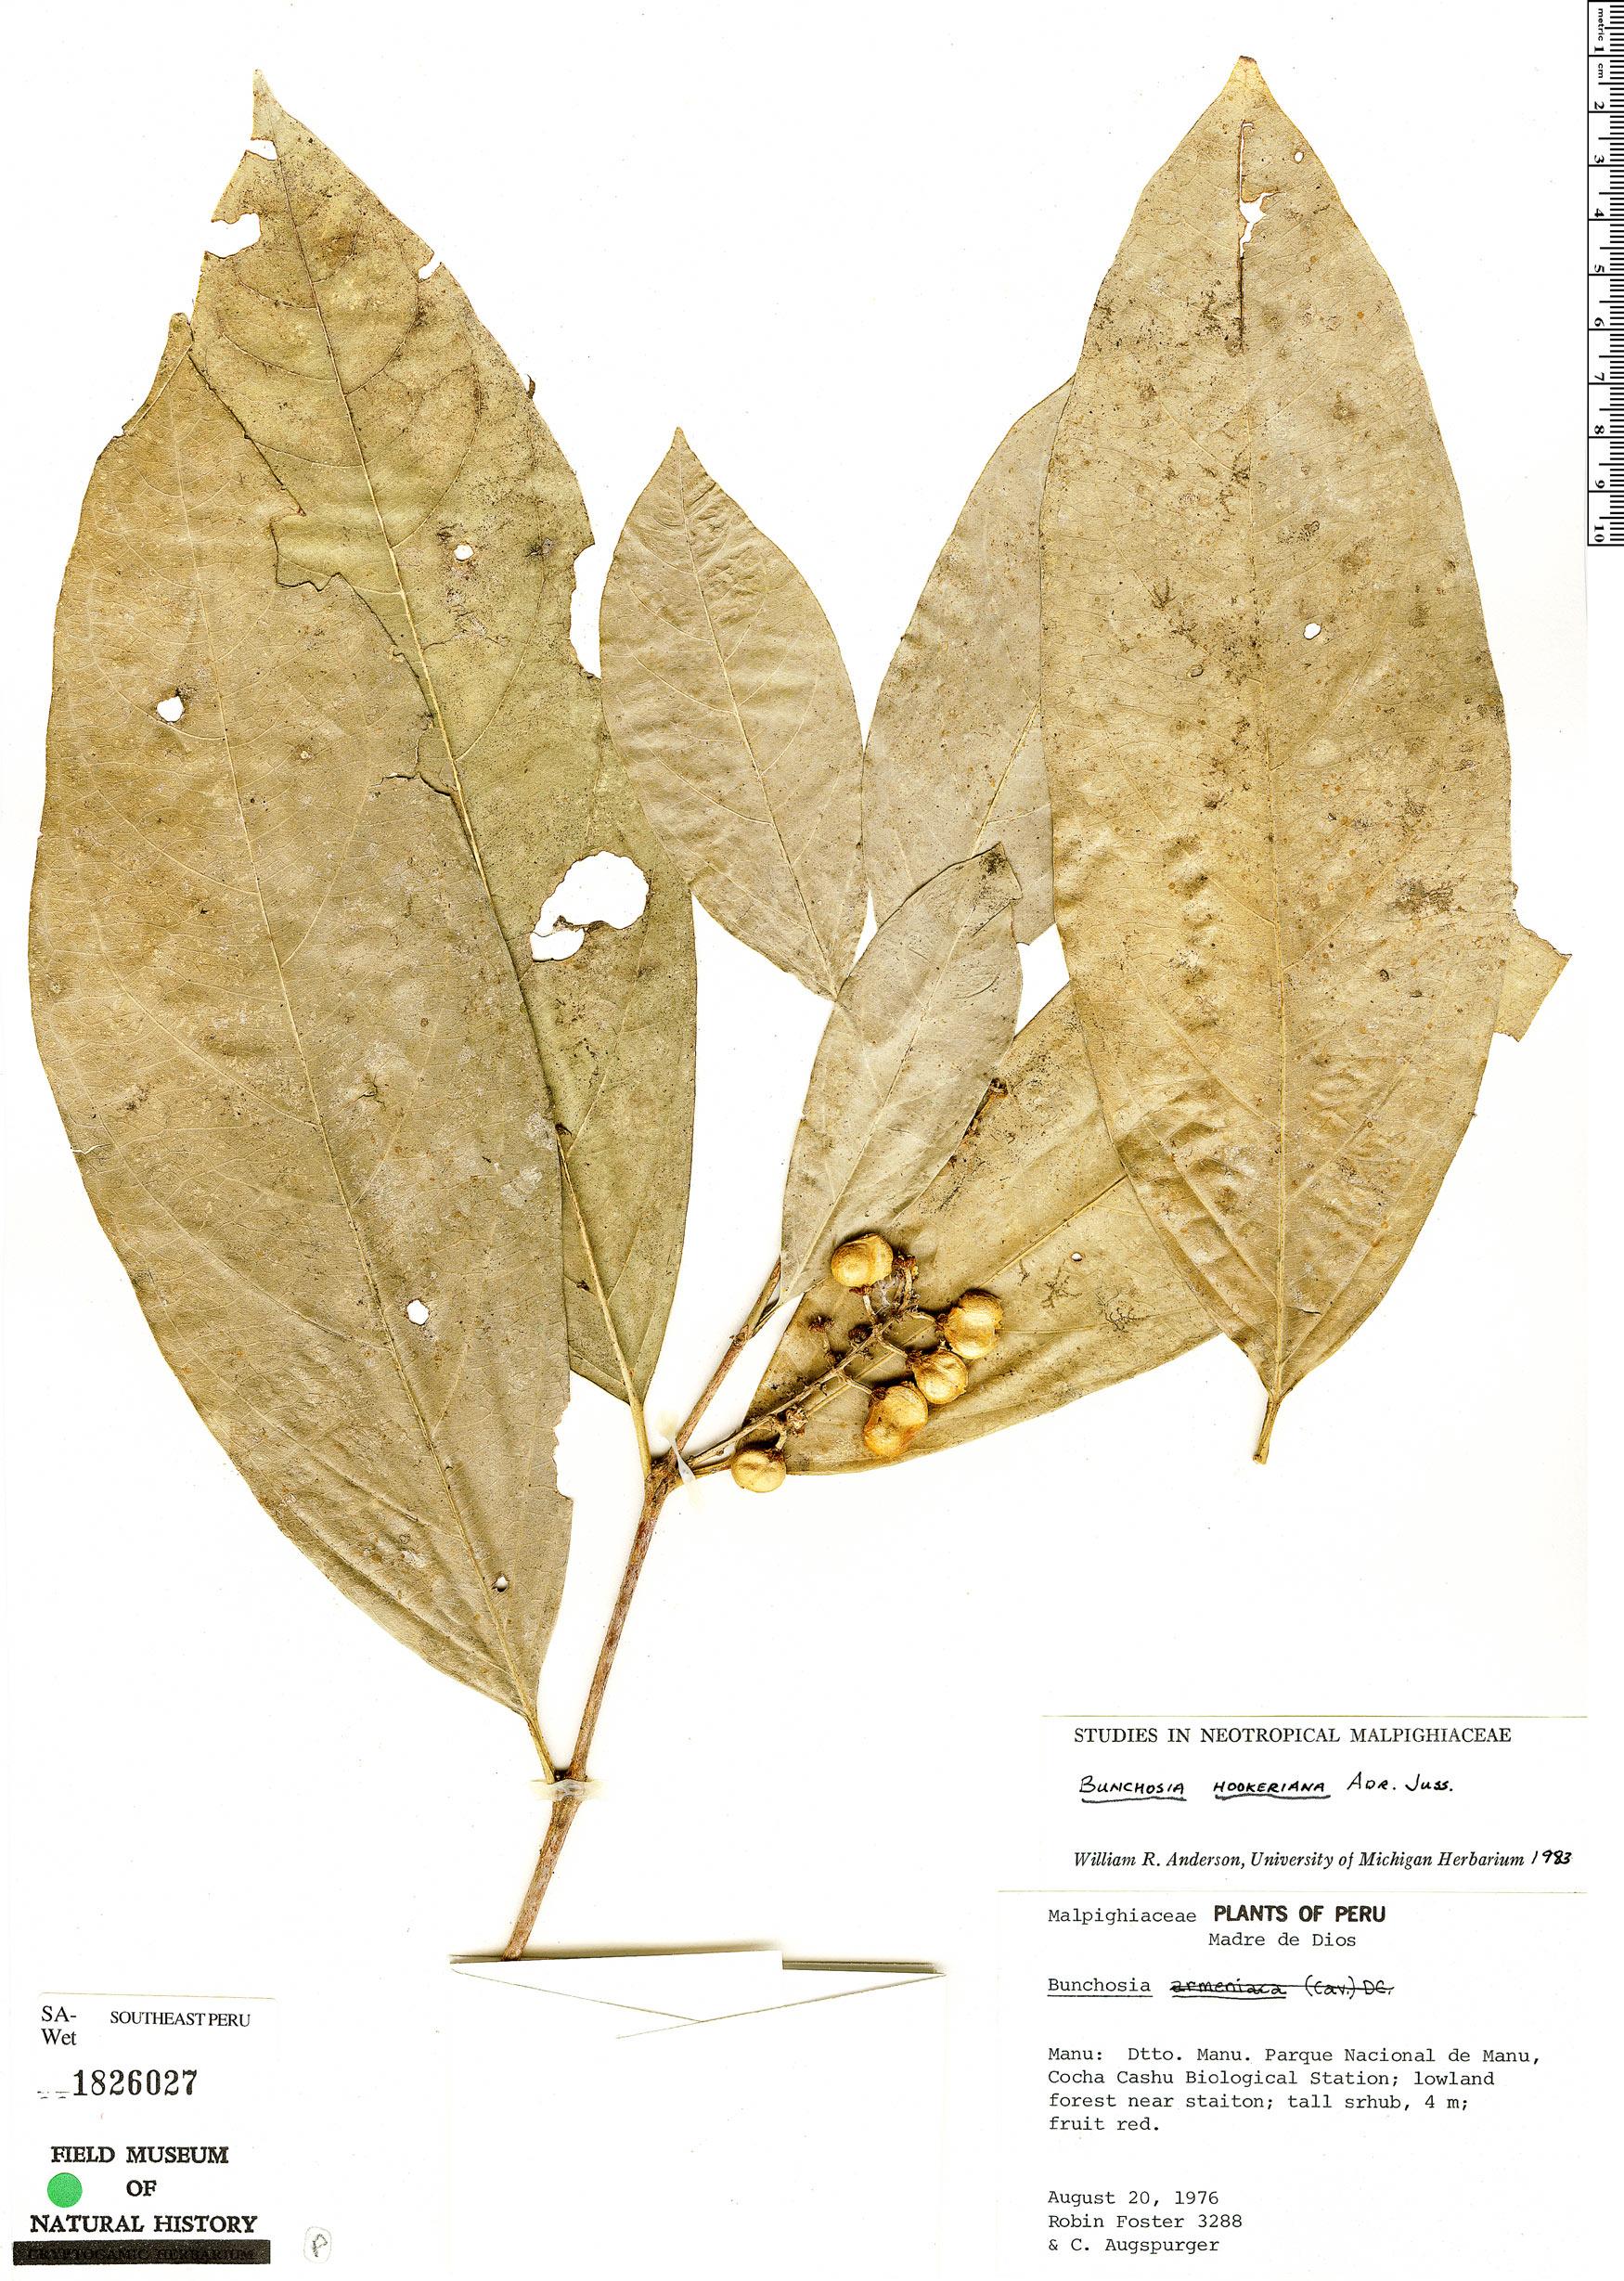 Espécime: Bunchosia hookeriana